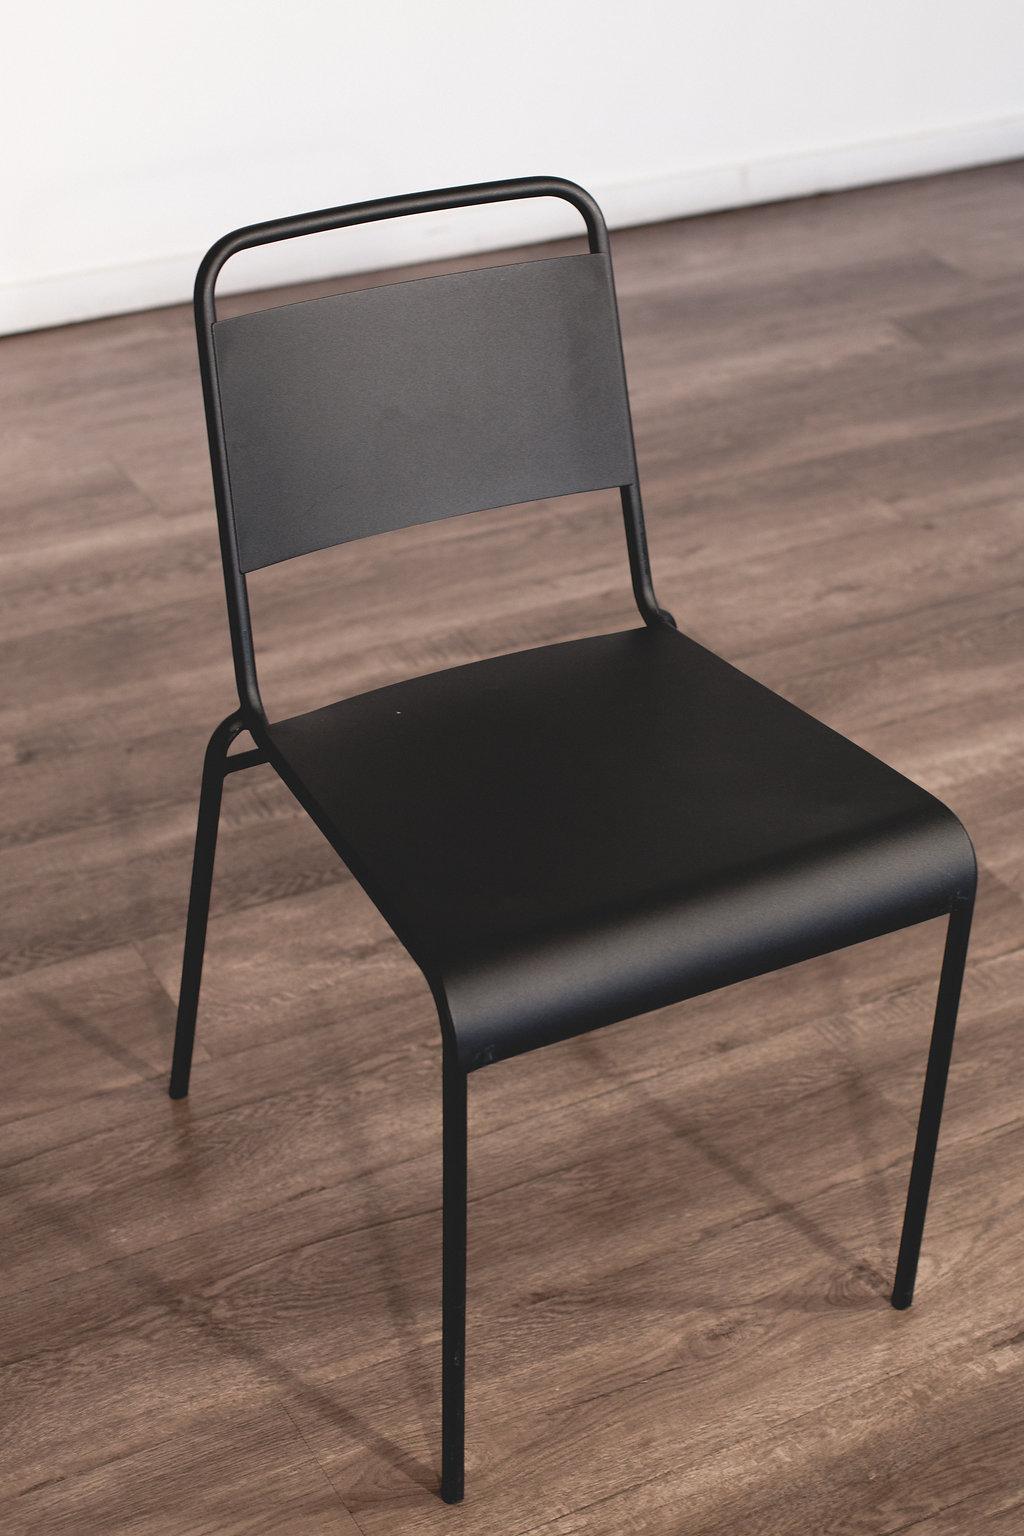 Black Metal Chair Quantity: 16 Price: $6 EA